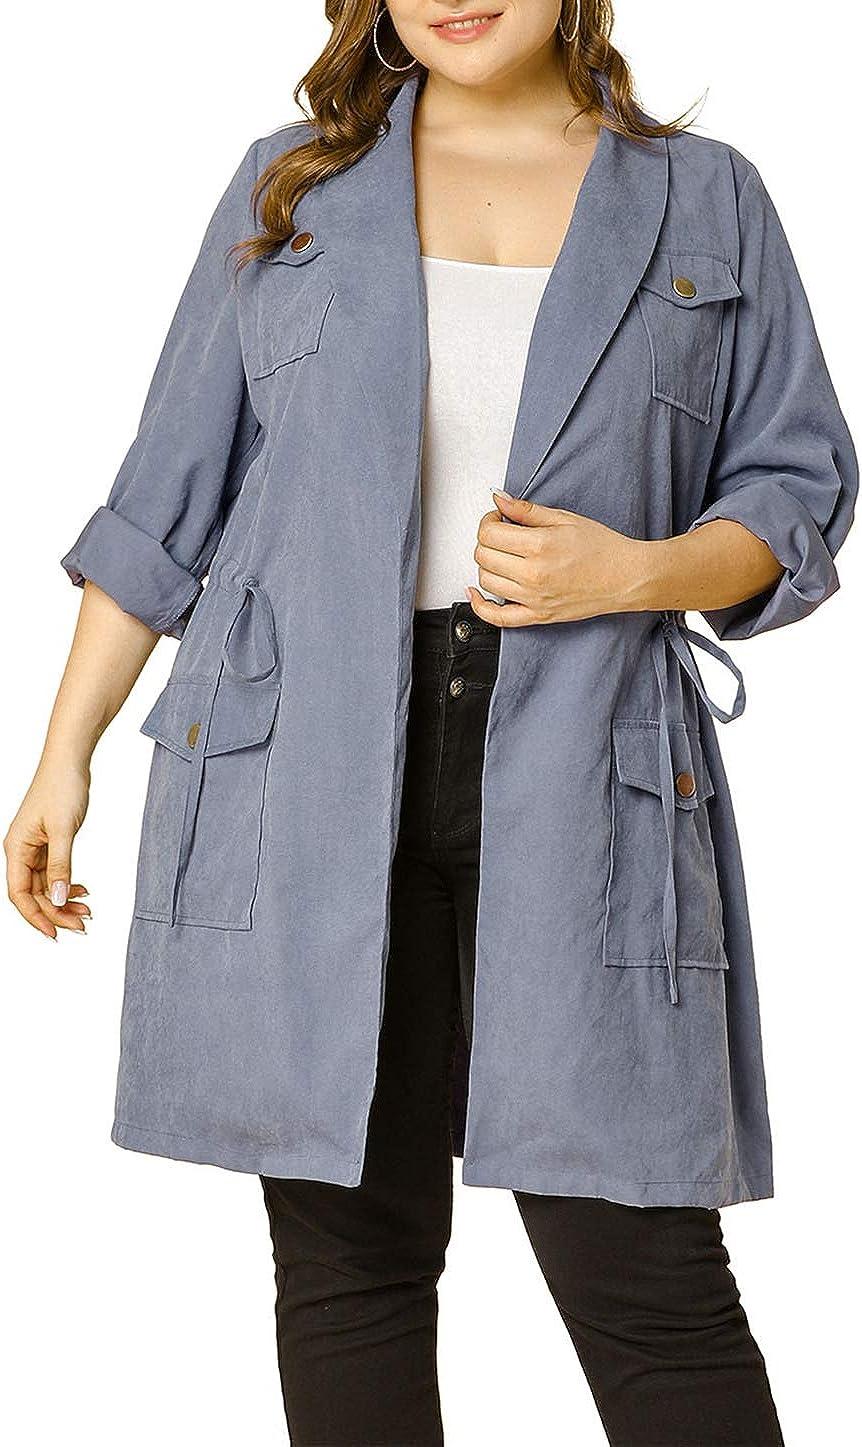 Agnes Orinda Women's Plus Size Lightweight Jacket Drawstring Casual Jackets